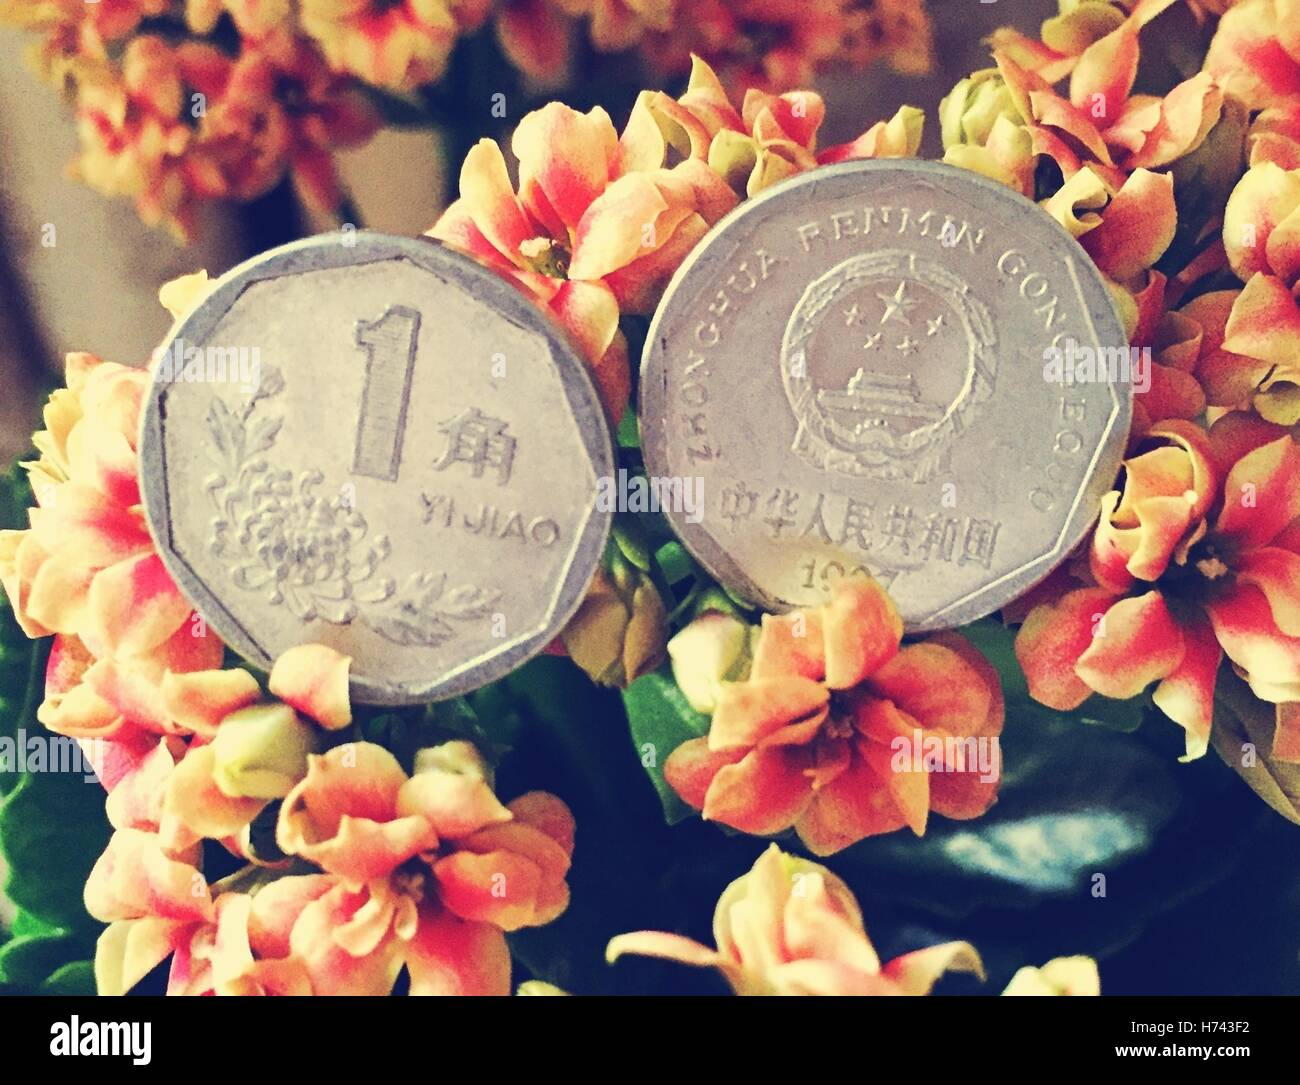 Jiao Coin Stockfotos Jiao Coin Bilder Alamy